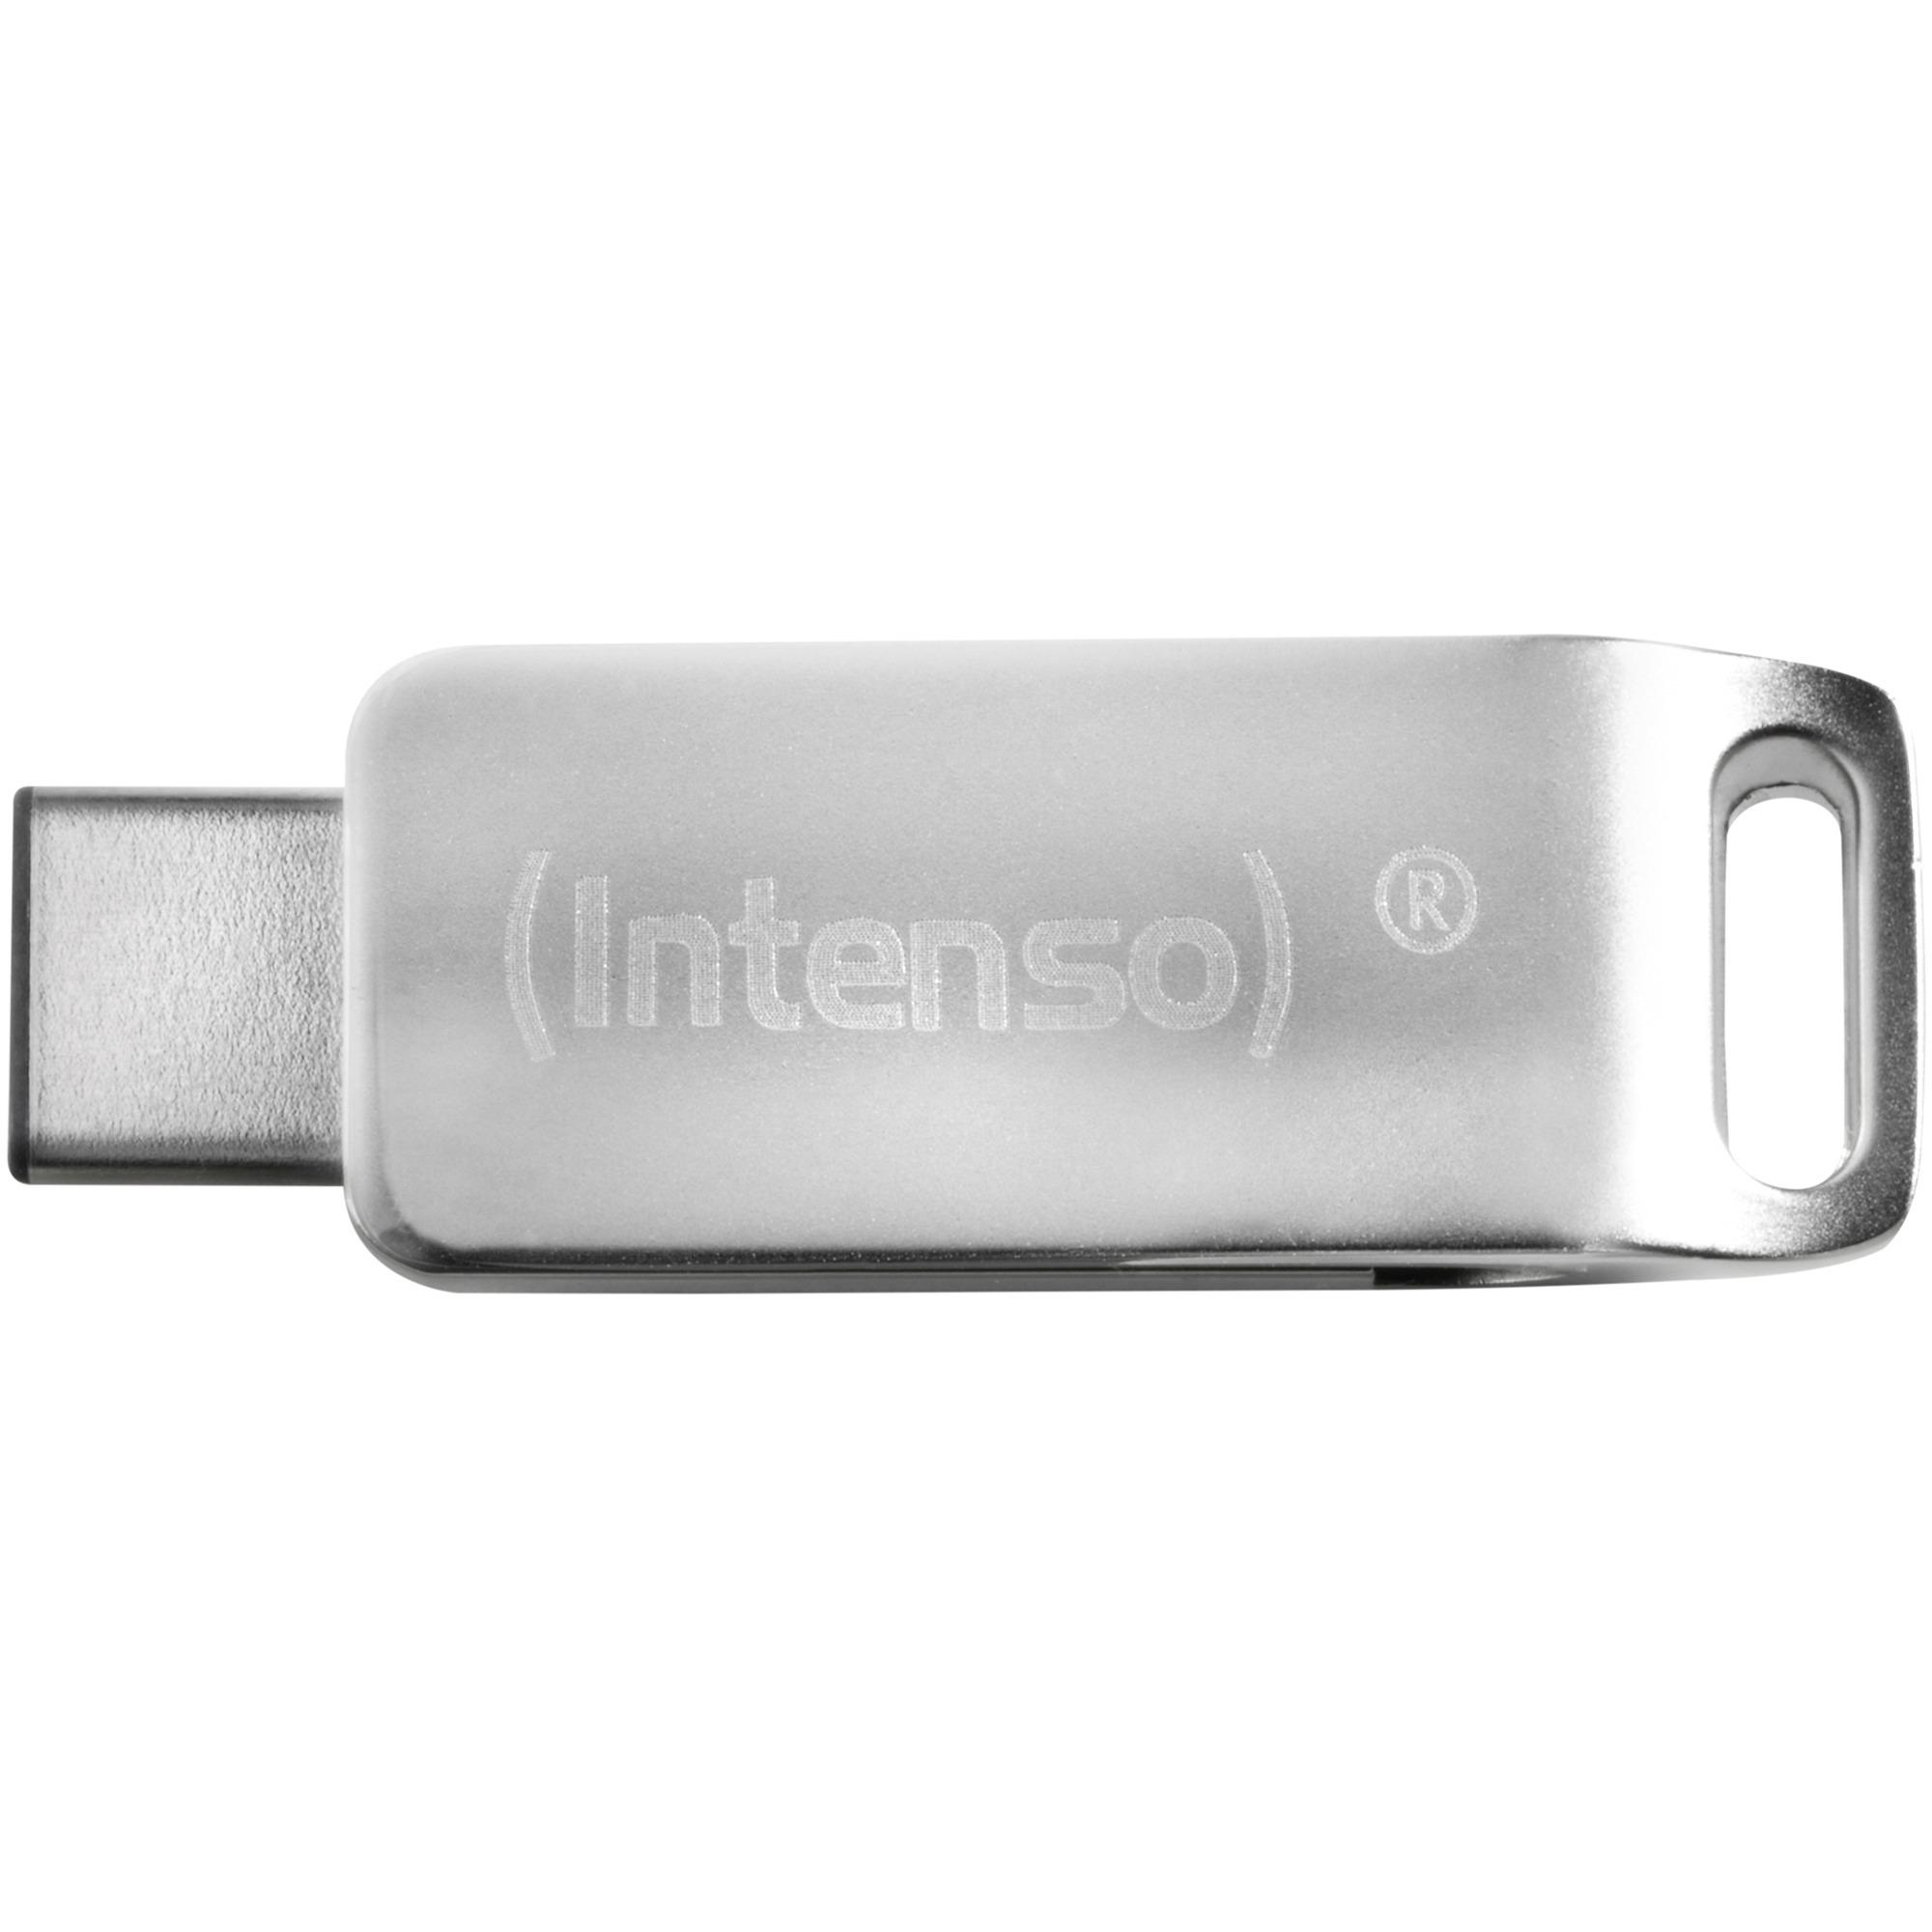 16GB cMobile Line 16GB USB 3.0 (3.1 Gen 1) Conector de USB tipo C Plata unidad flash USB, Lápiz USB